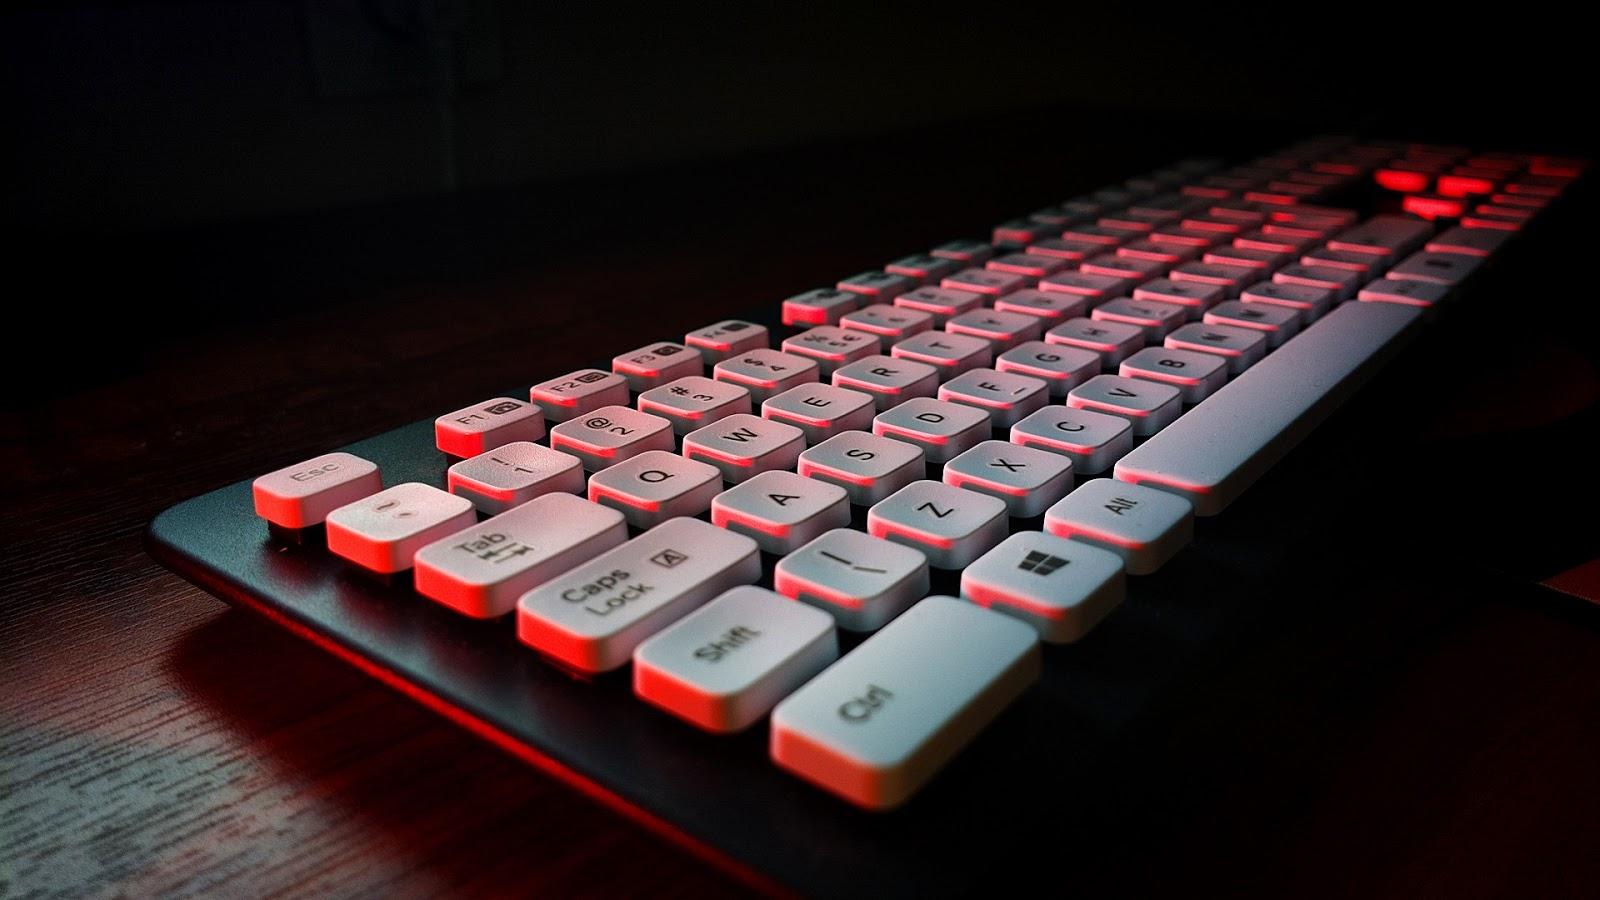 royale keyboard